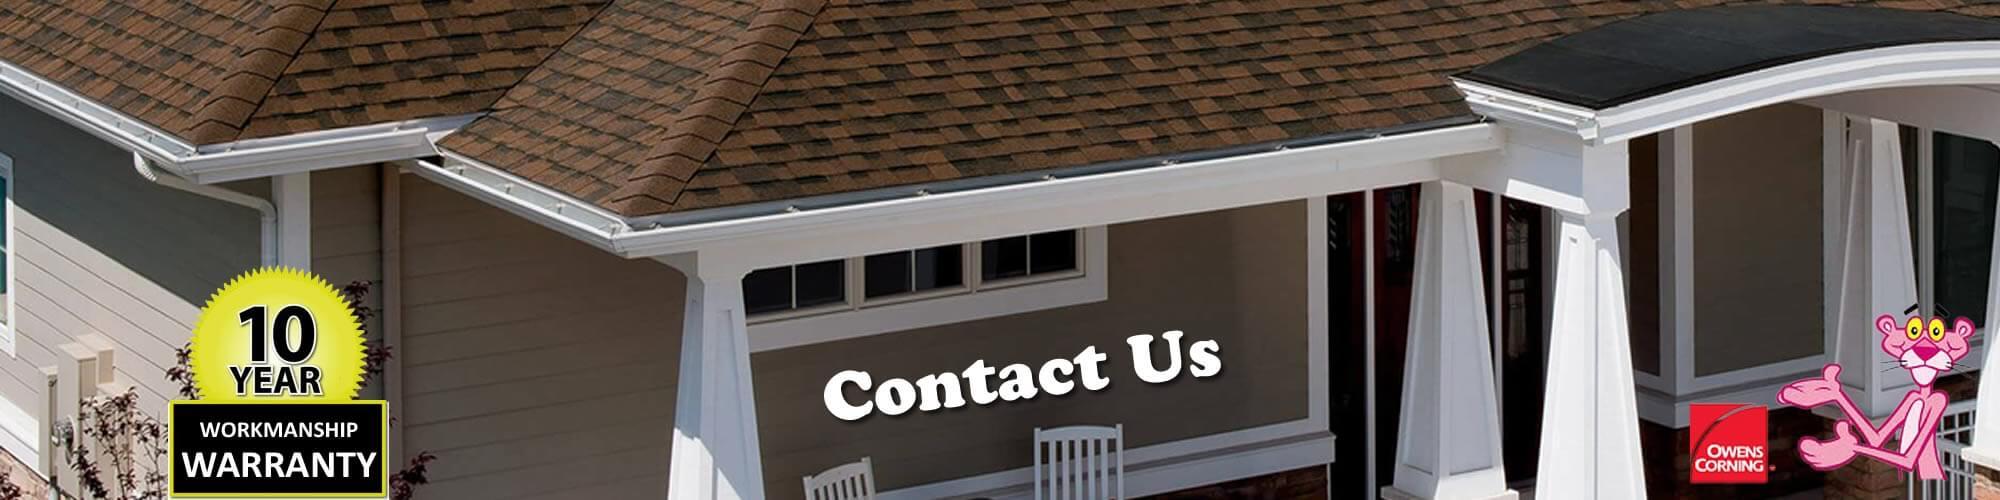 Contact Roofing Contractor Grand Blanc, Davison, Flint Michigan